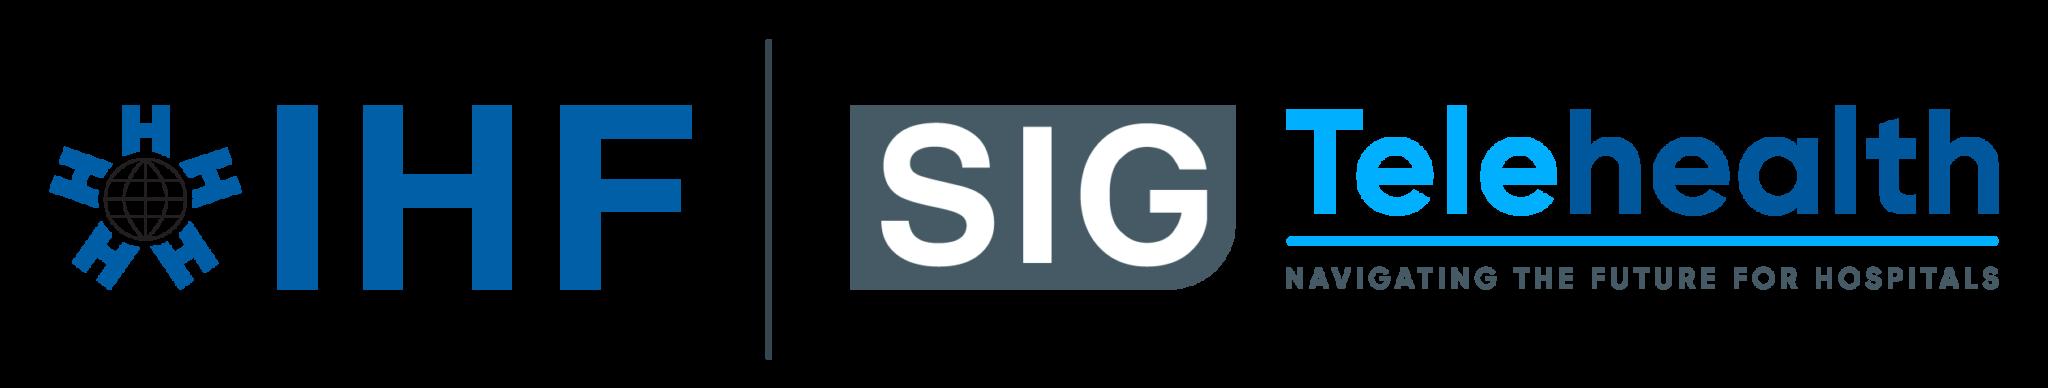 IHF_SIG_Telehealth__Standard_wIHF-2048x388.png